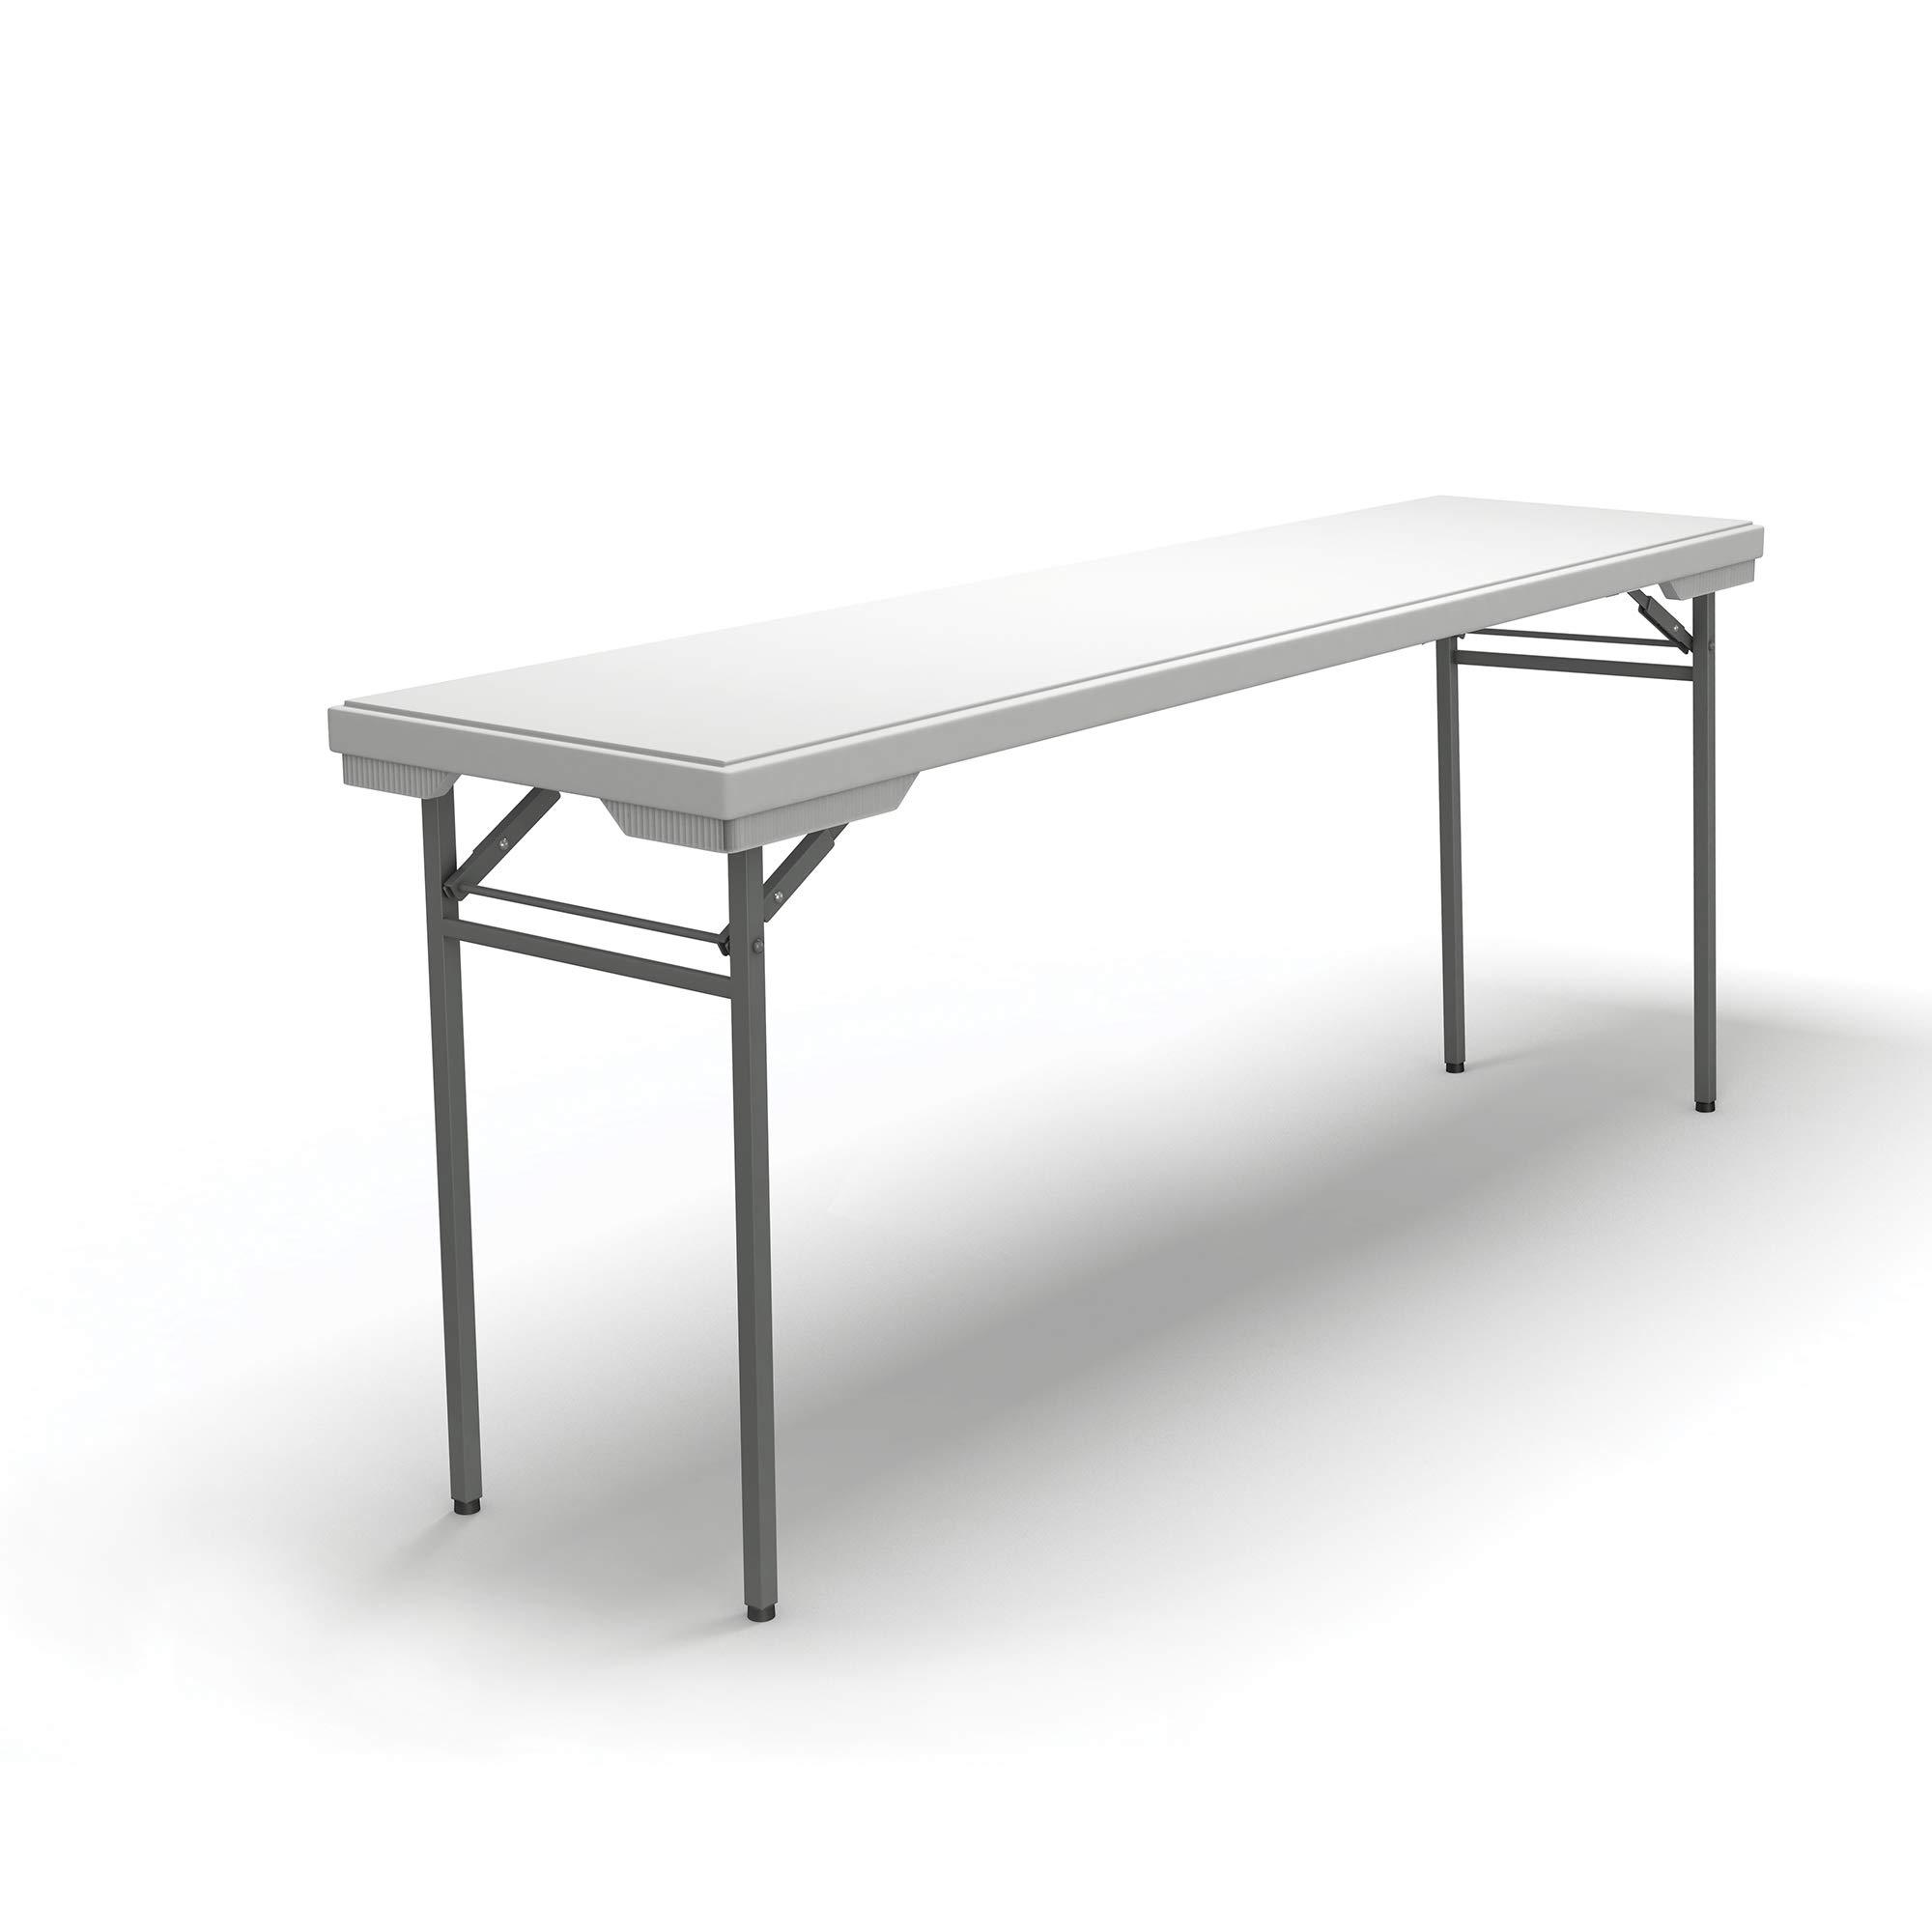 Mayline 721872DGWT Event Series Rectangle Folding Table 72W x 18D, White Top/Dark Gray Base